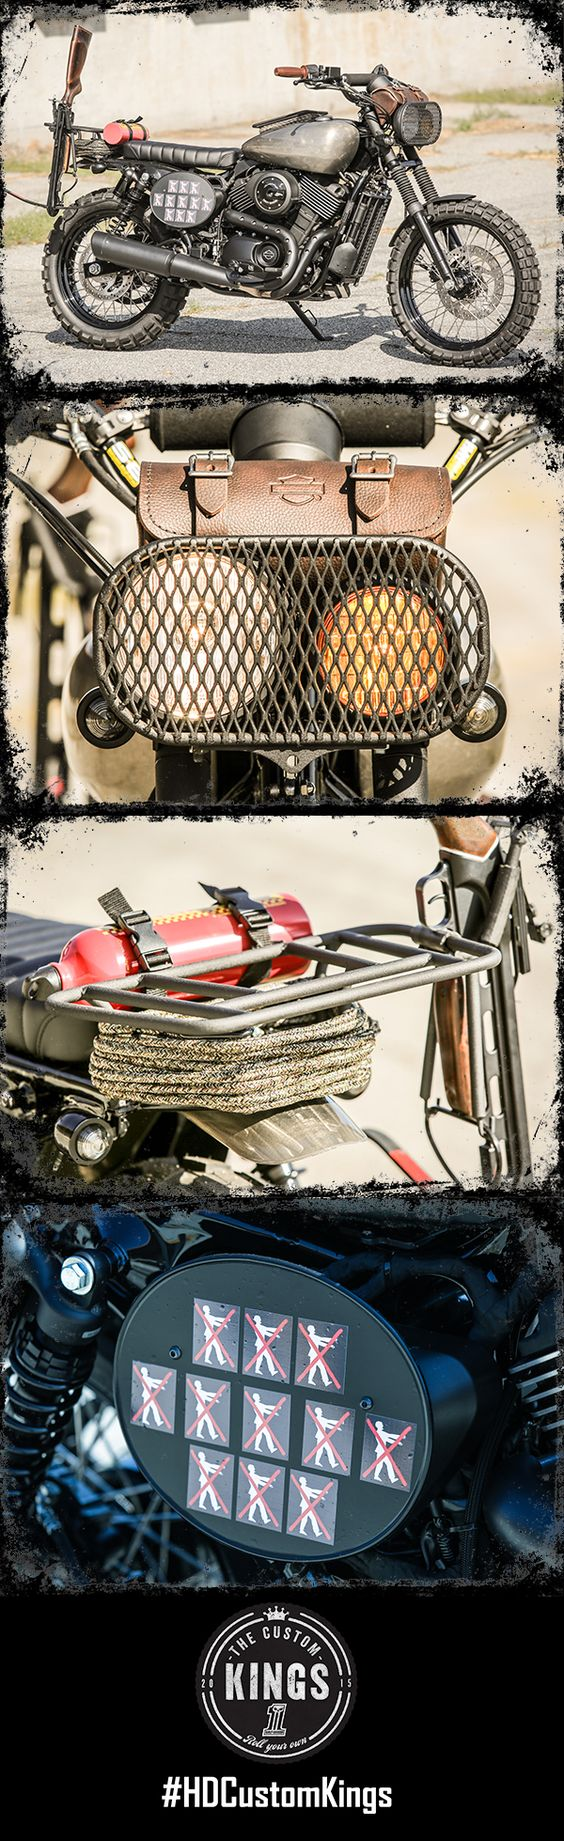 Los Angeles Harley-Davidson of Anaheim's #HDStreet scrambler